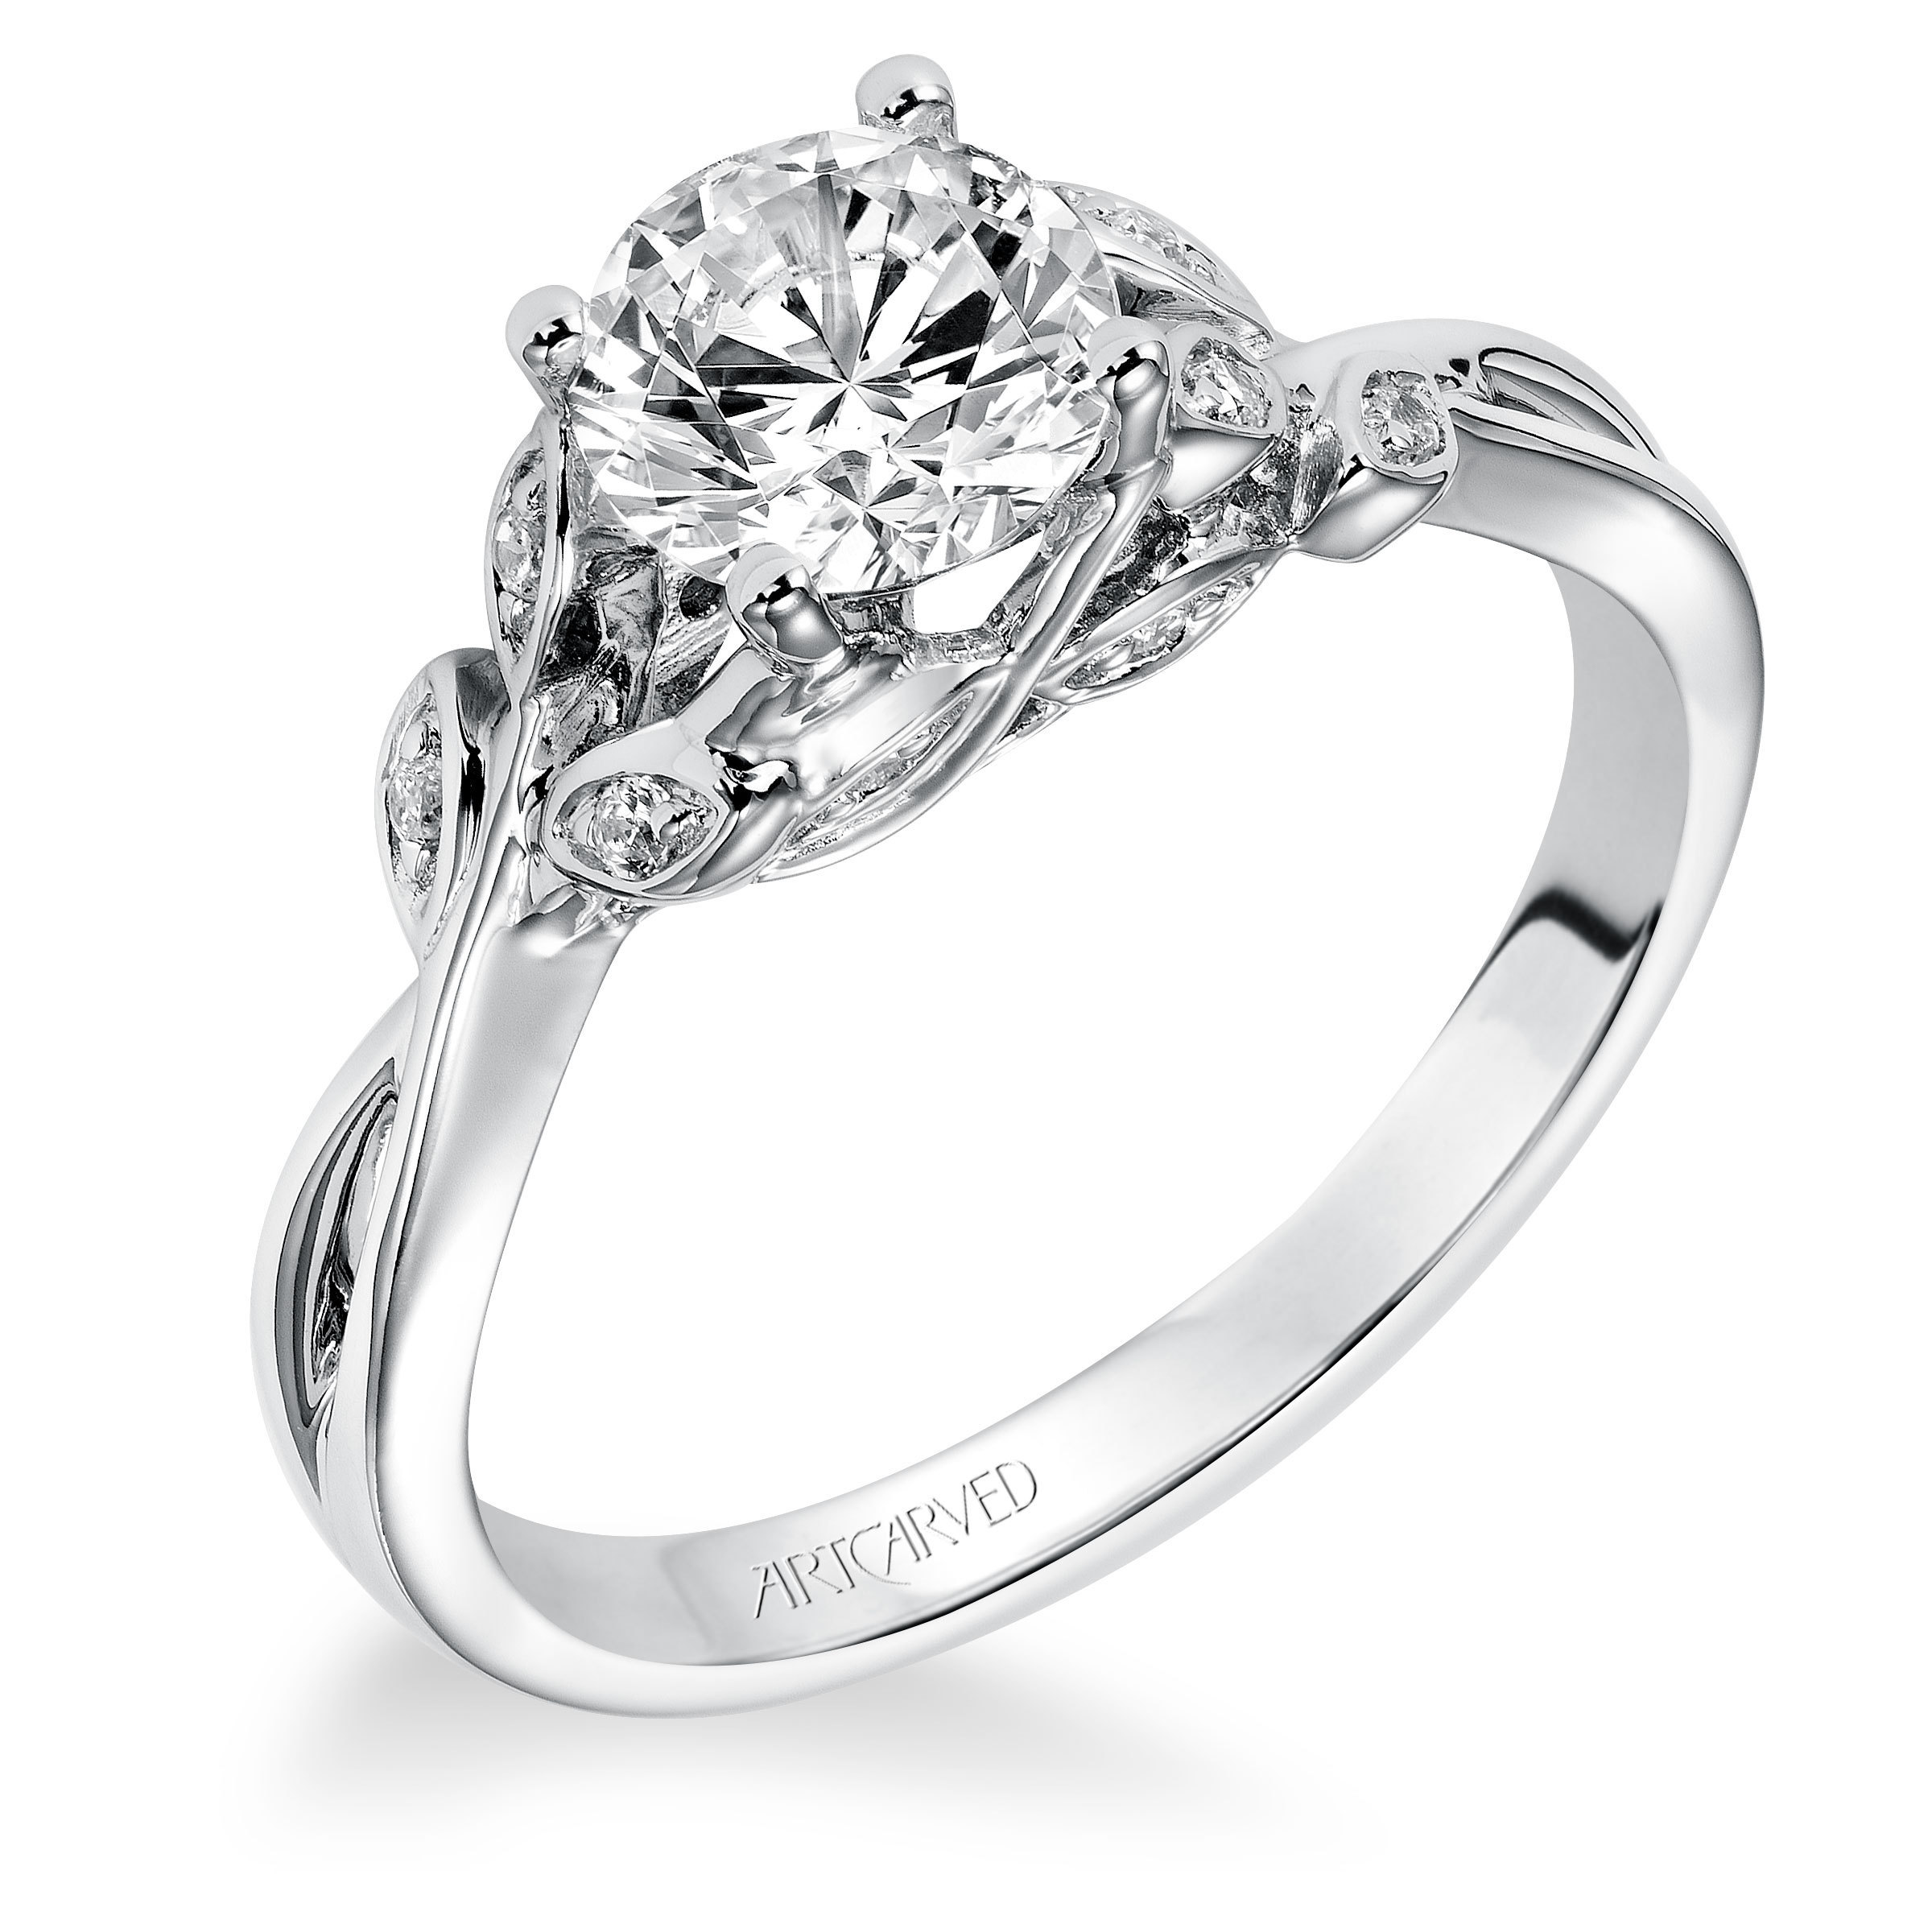 design your own wedding ring - becker's diamonds & beckers jewelers